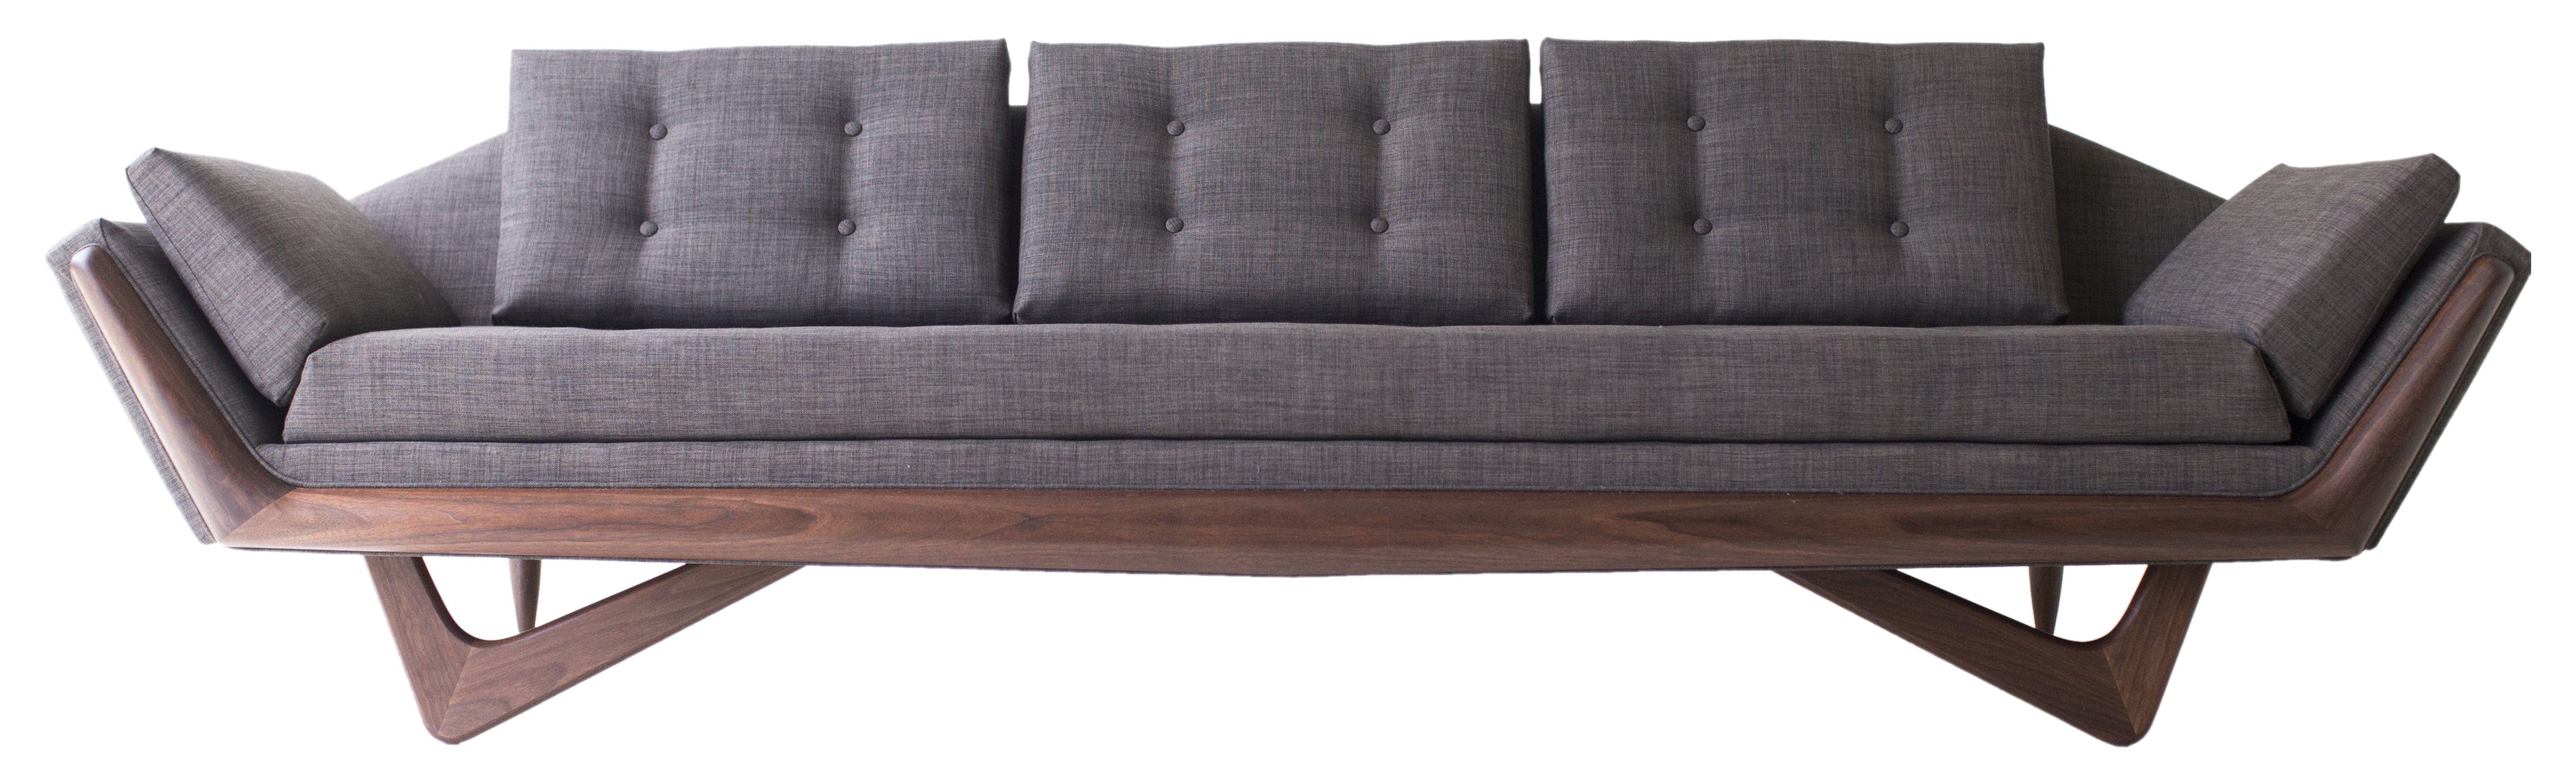 Buy modern sofa 1404 craft associates furniture by craft associates furniture